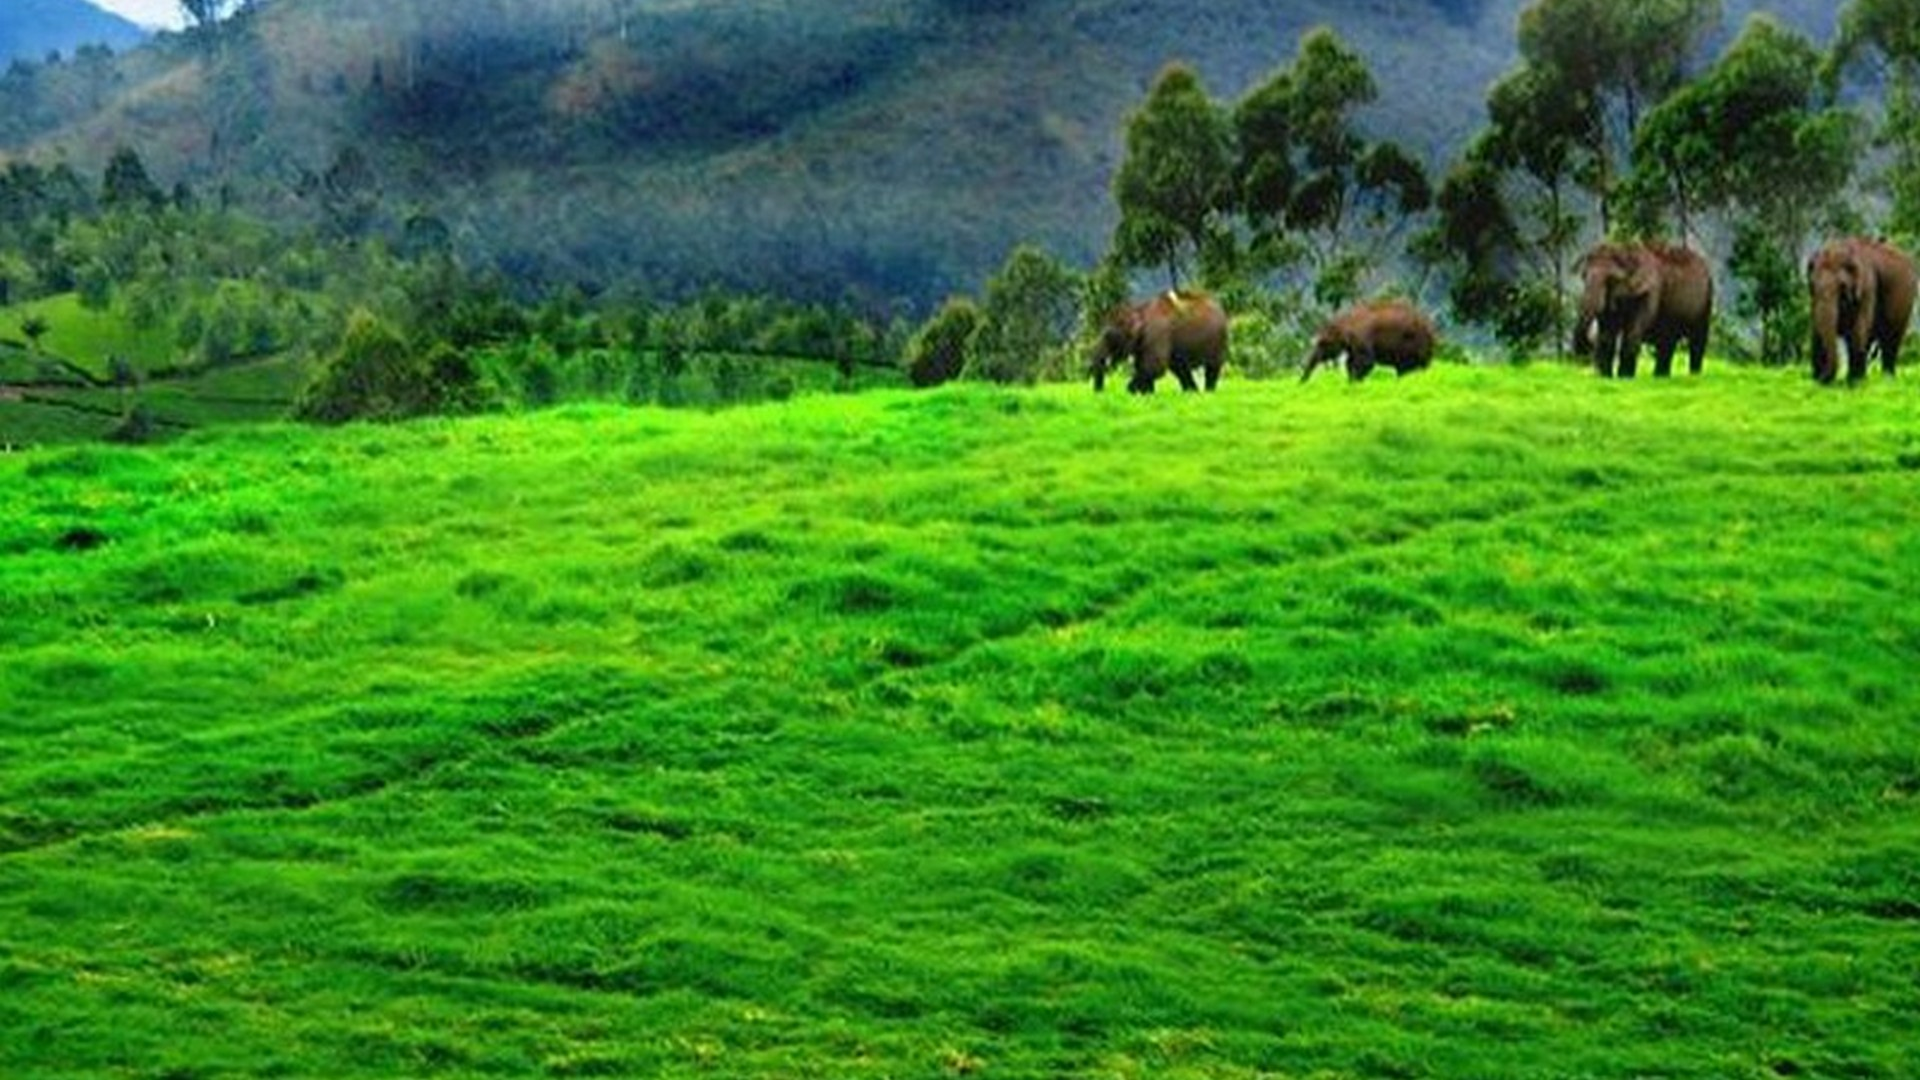 Kerala Elephant Hd Wallpapers 1920x1080